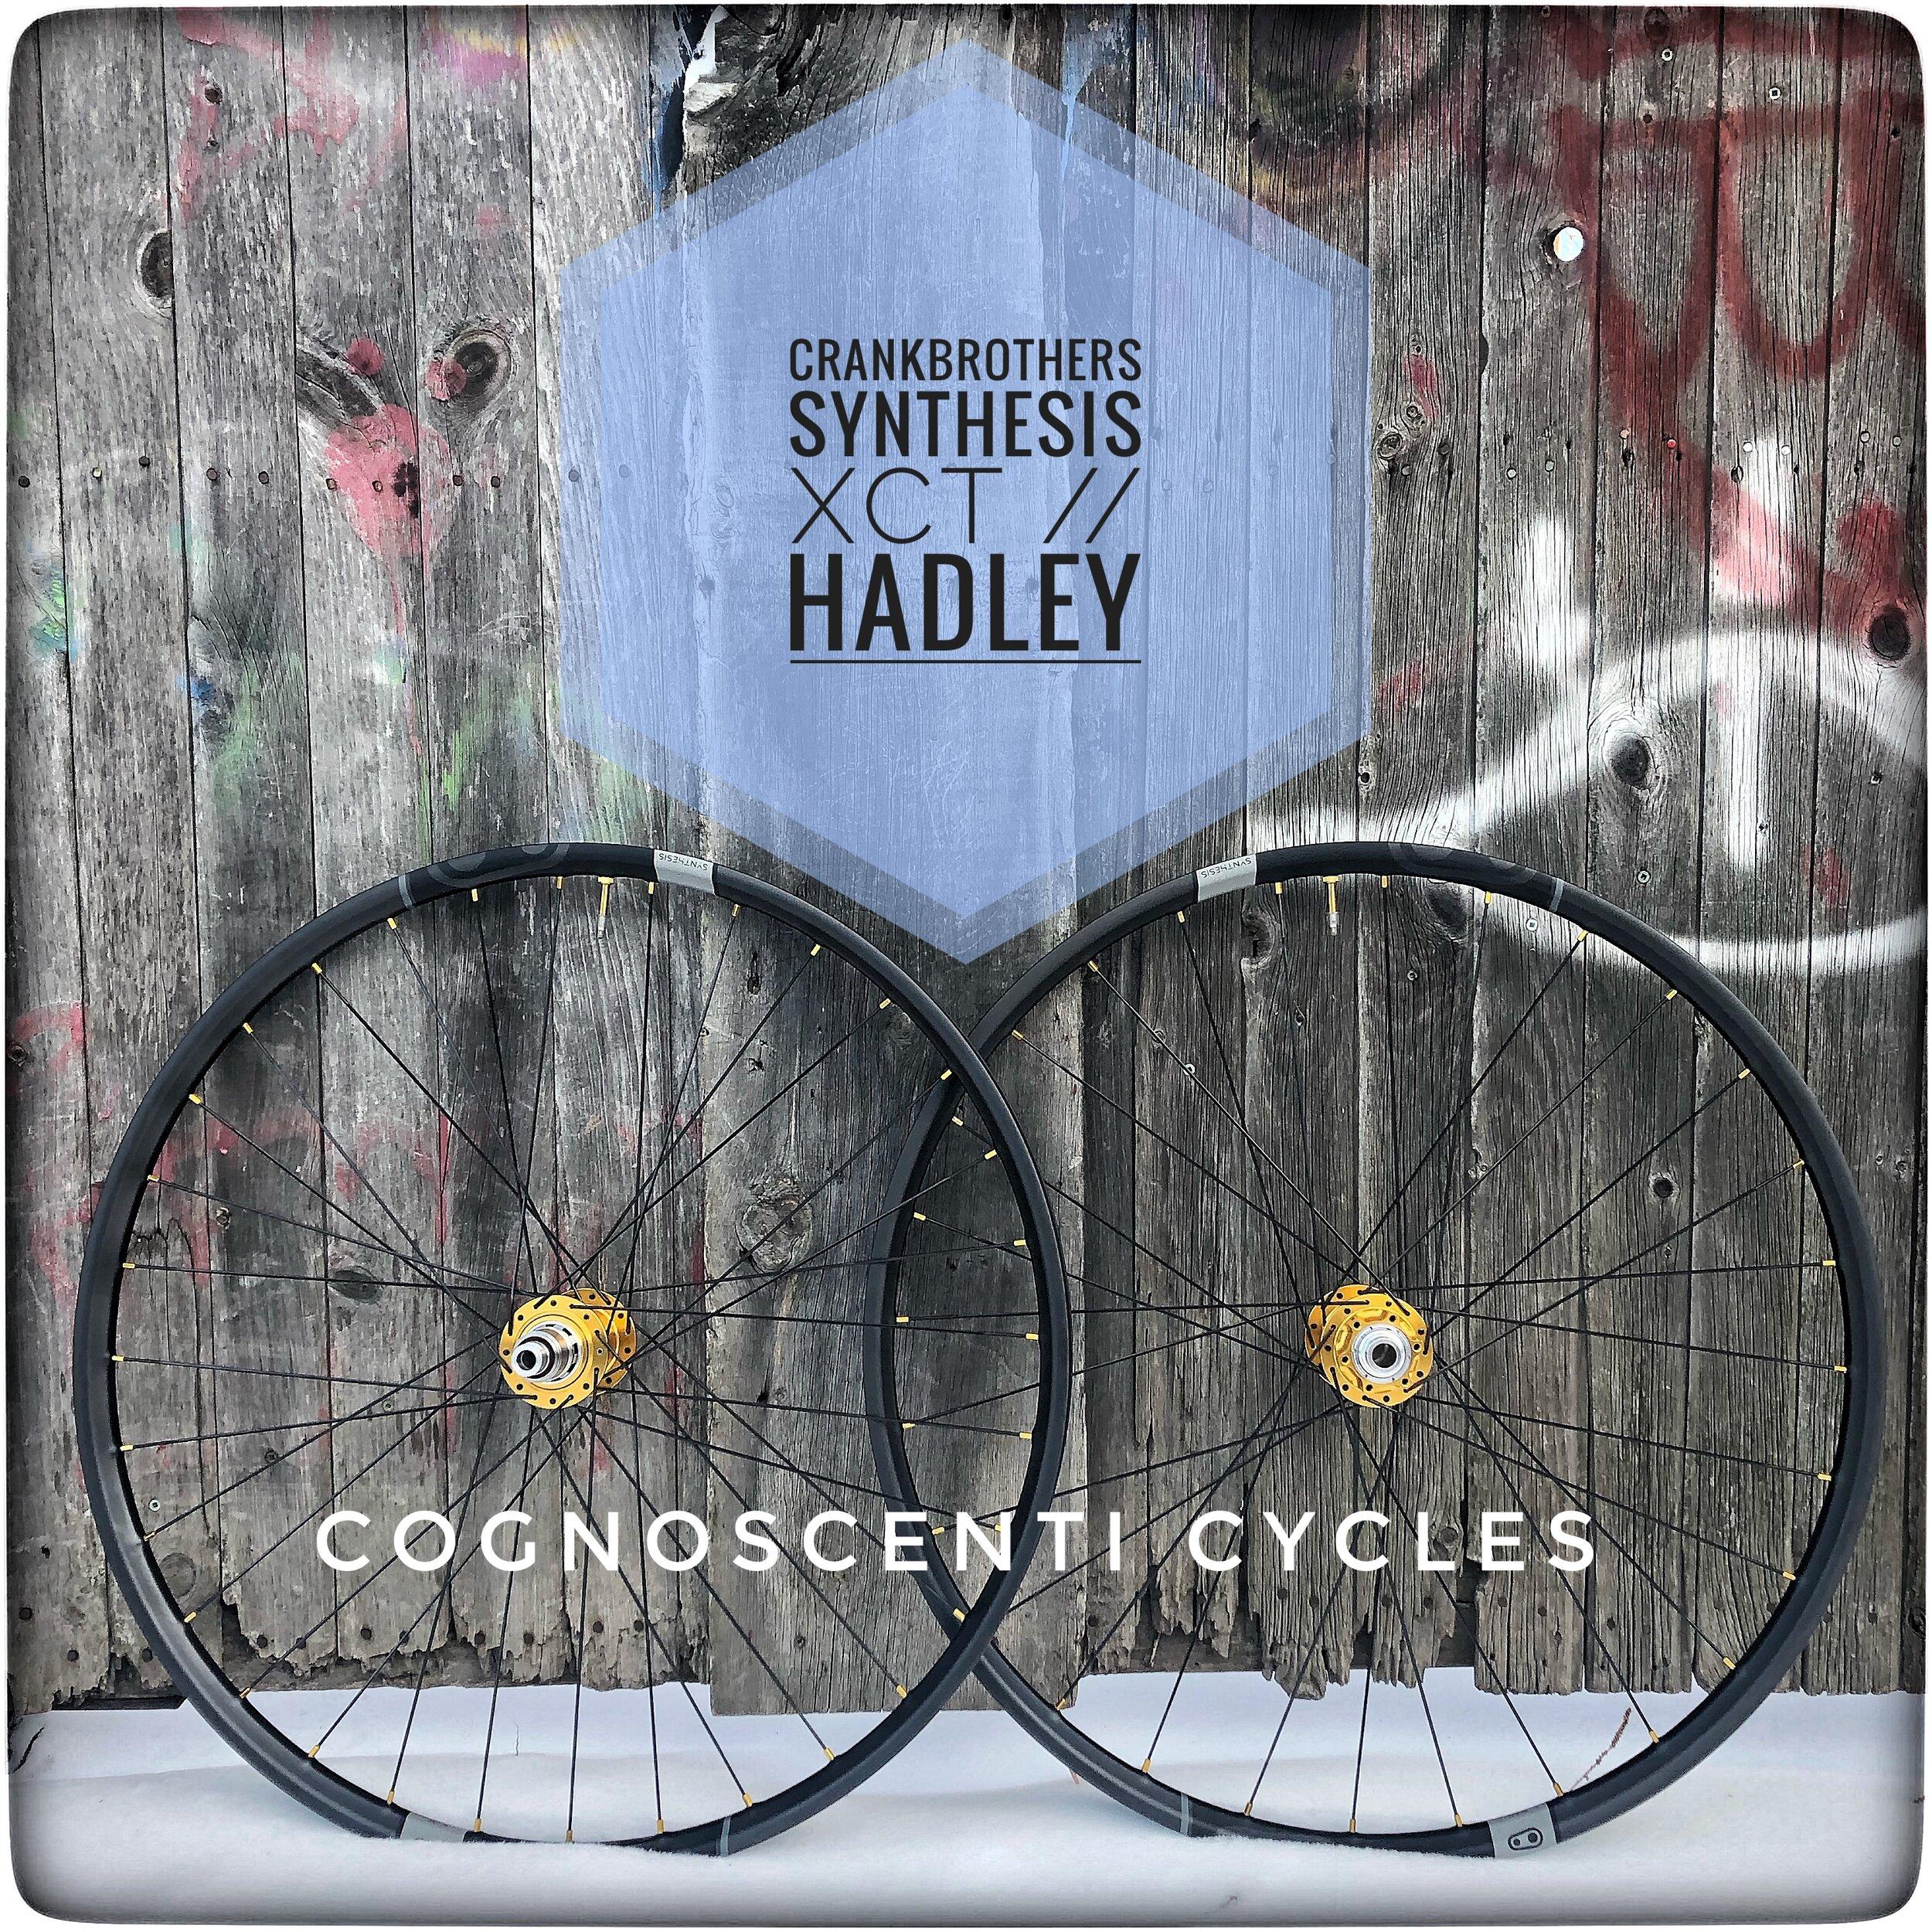 Night Cyclist TRUSTED UK SELLER Brilliant LED Bike Bicycle Spoke Wheel Lights